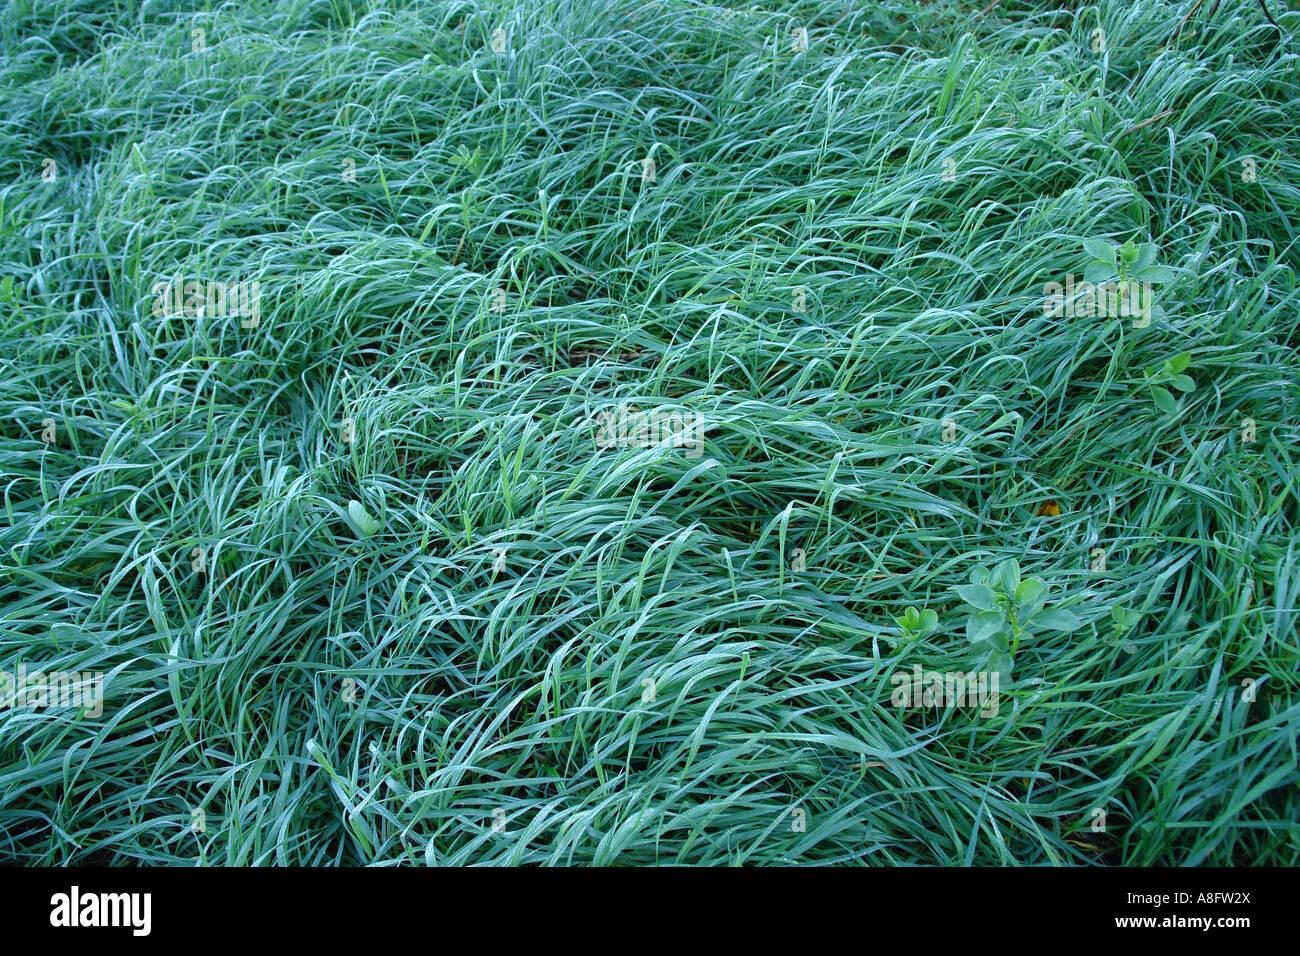 Green grassland in morning moisture - Stock Image